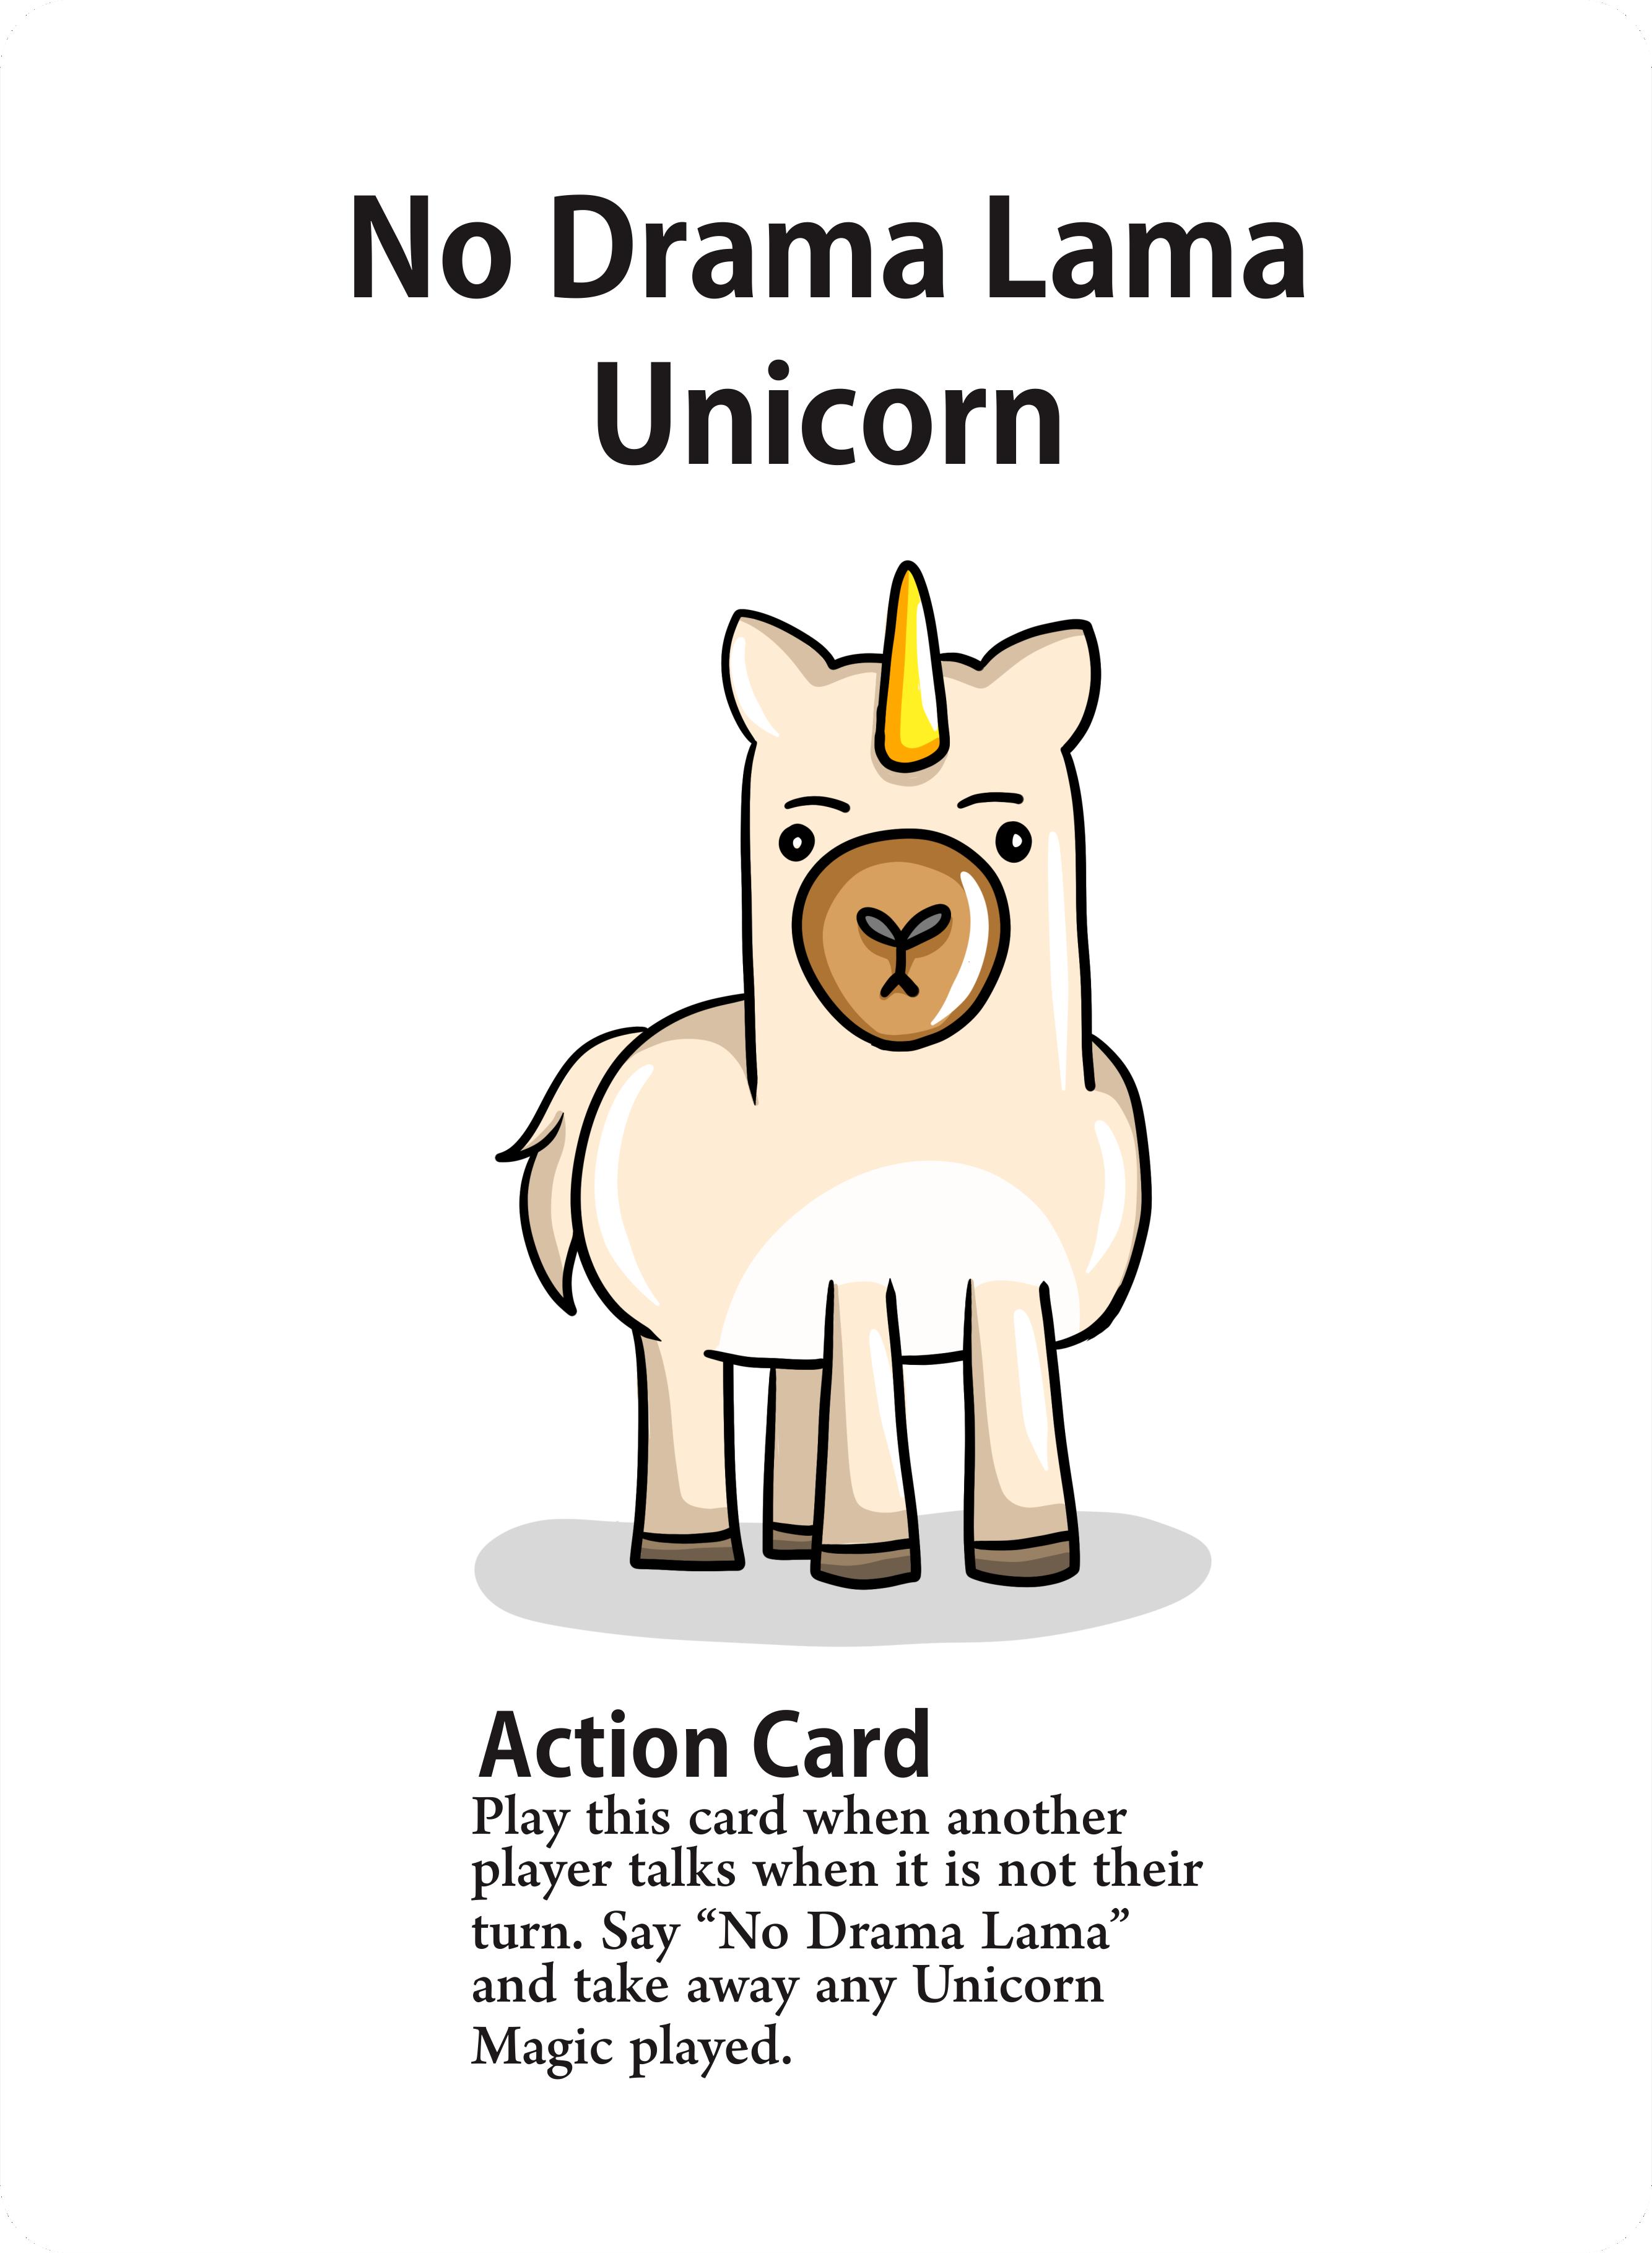 Unicorn Game cards